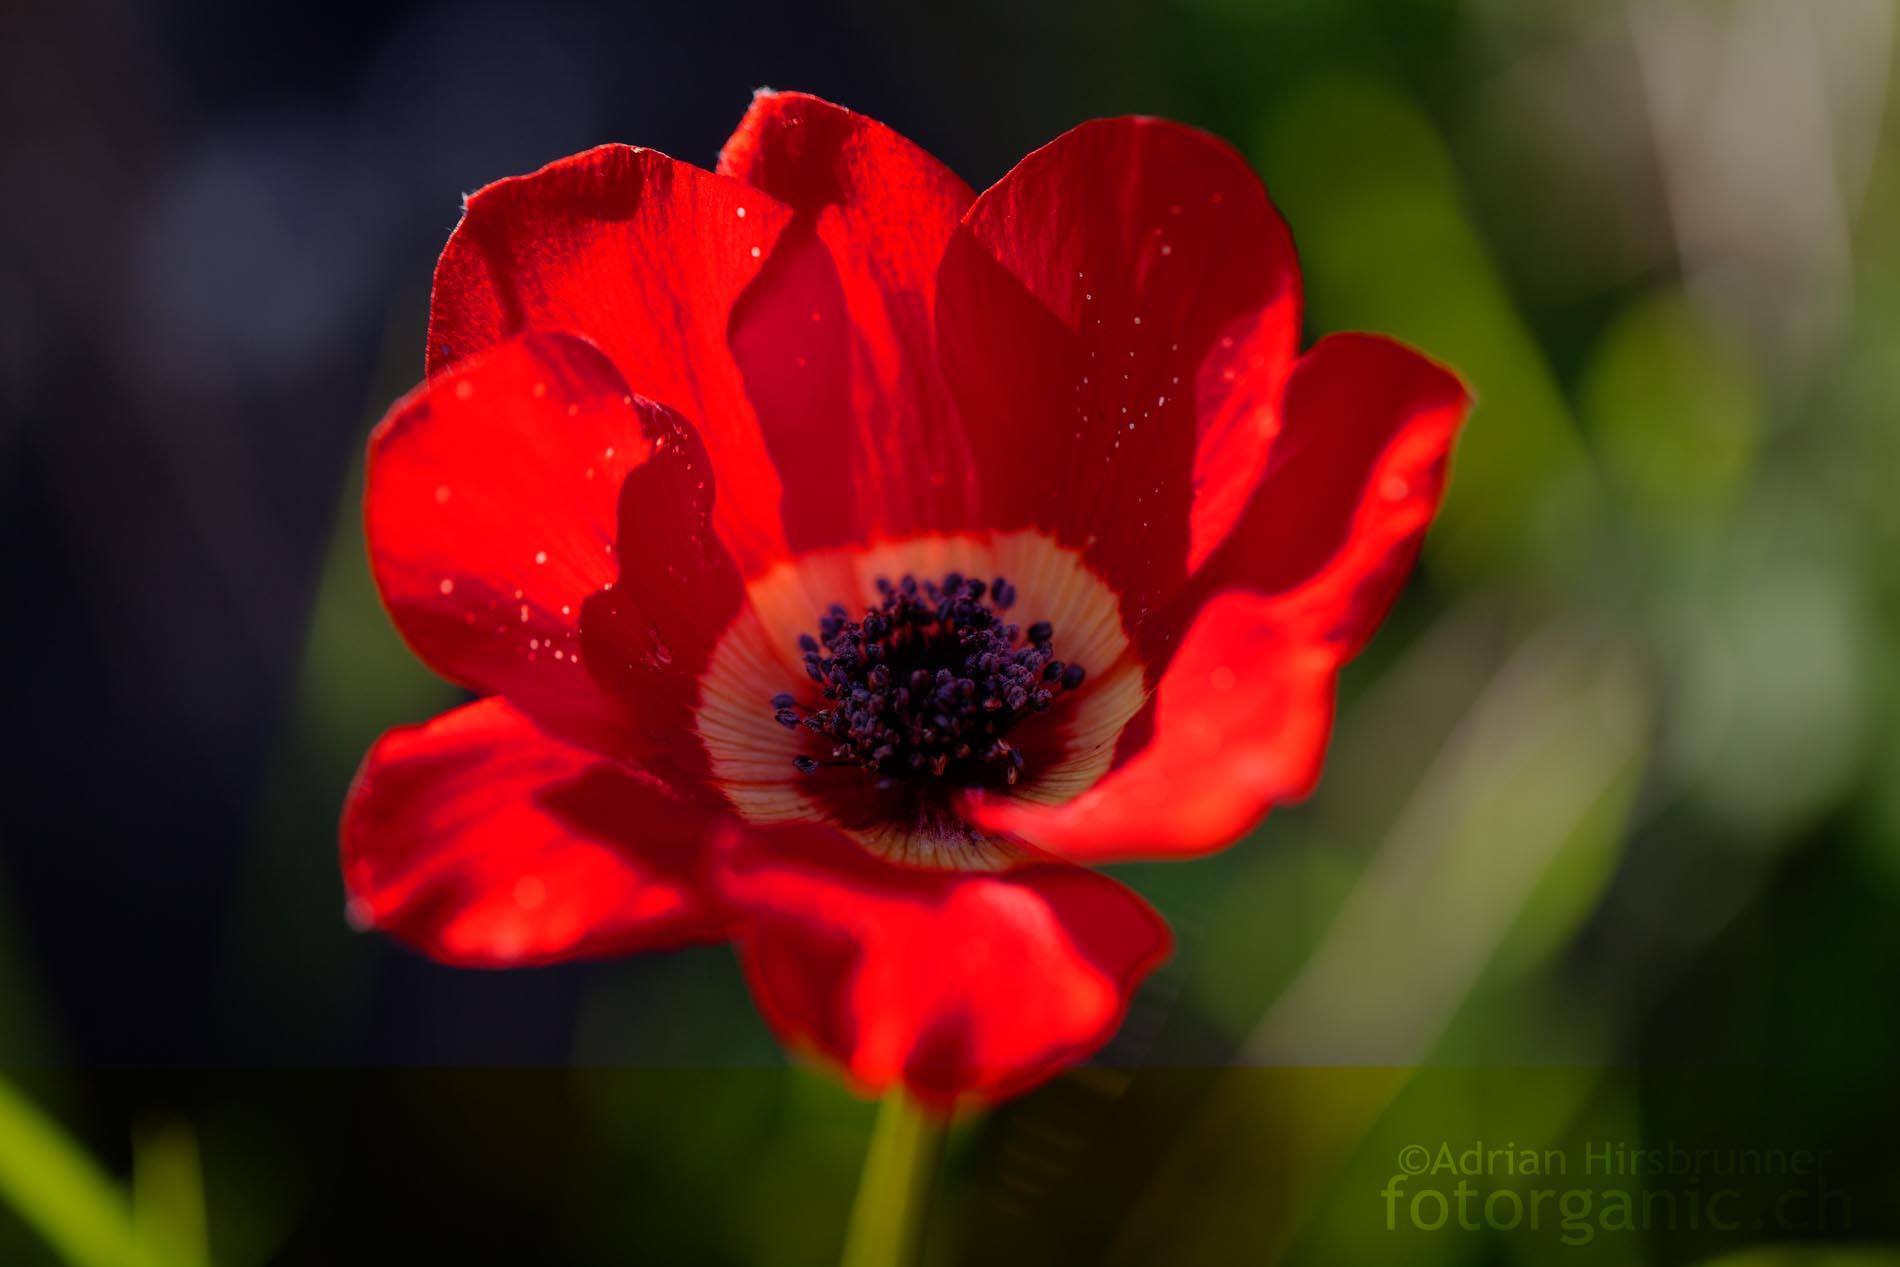 rot flammenmeer der kronen anemone naturfotografie adrian hirsbrunner. Black Bedroom Furniture Sets. Home Design Ideas